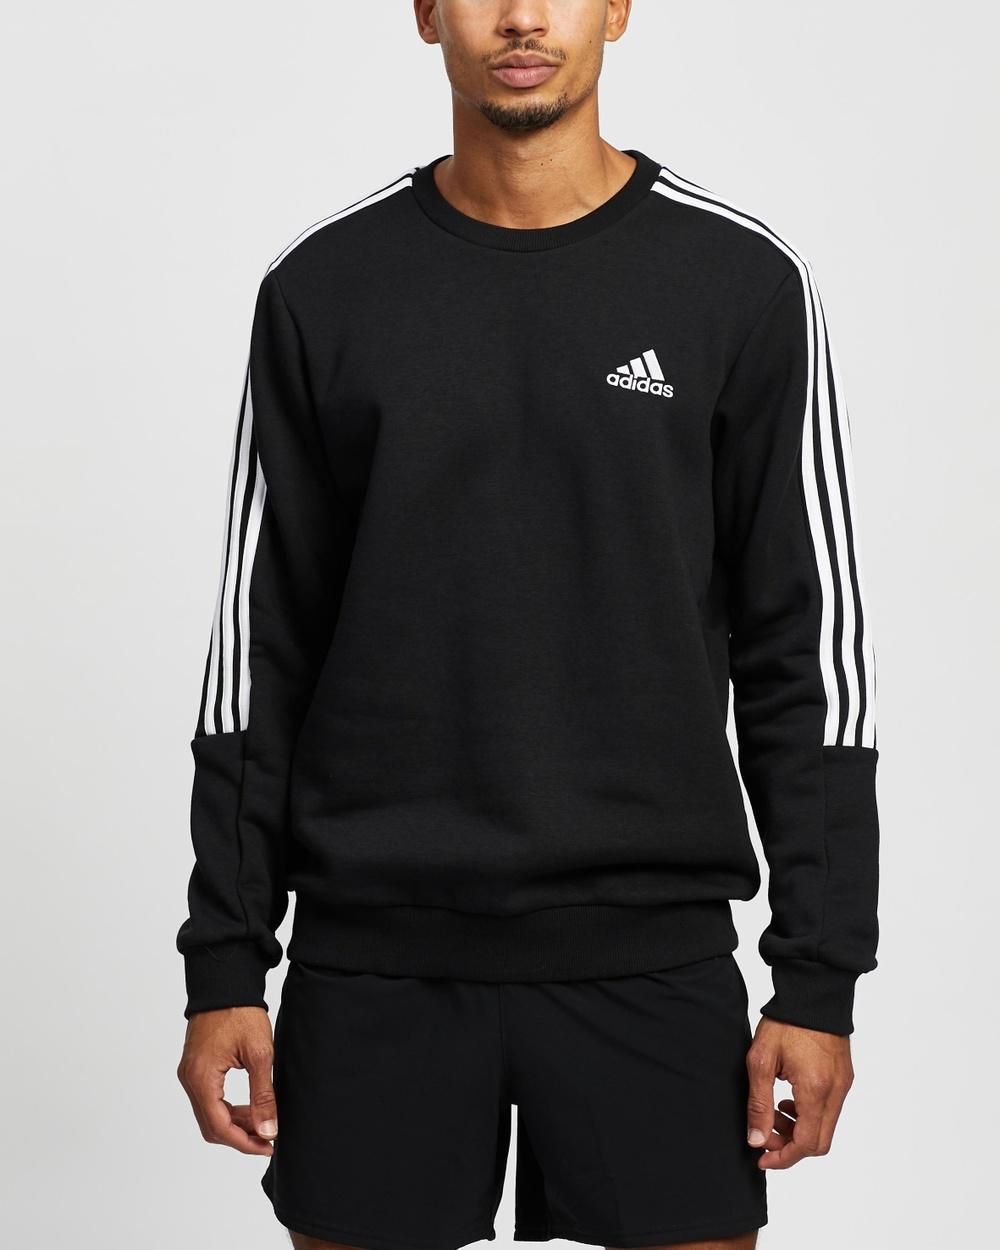 adidas Performance Cut 3 Stripe Sweatshirt Crew Necks Black & White 3-Stripe